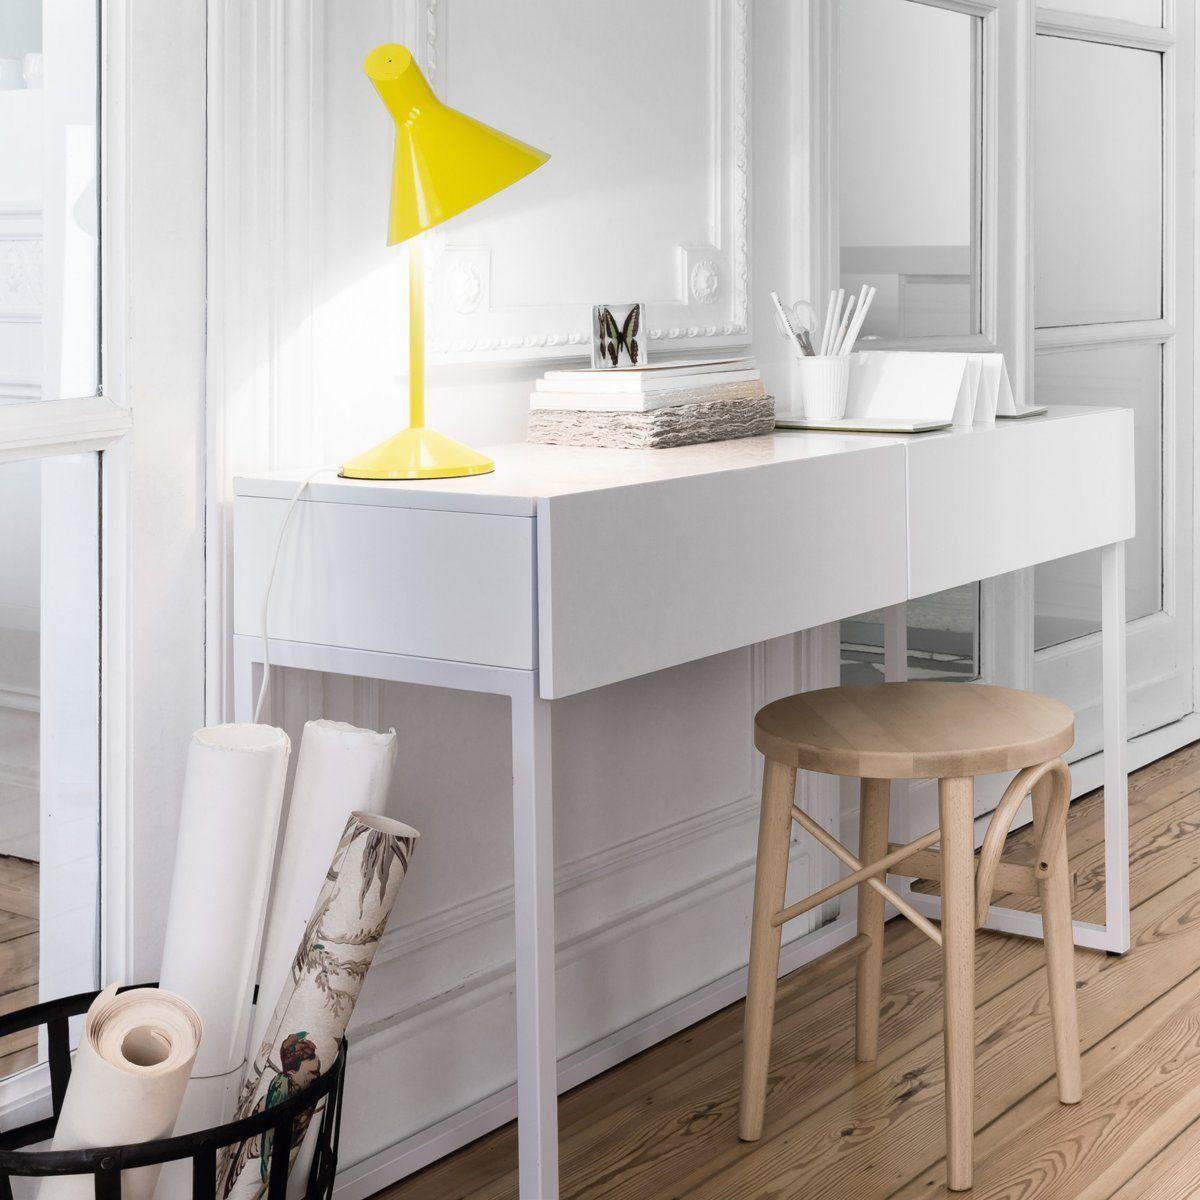 console bureau 2 tailles newark la redoute interieurs la redoute bureau home pinterest. Black Bedroom Furniture Sets. Home Design Ideas